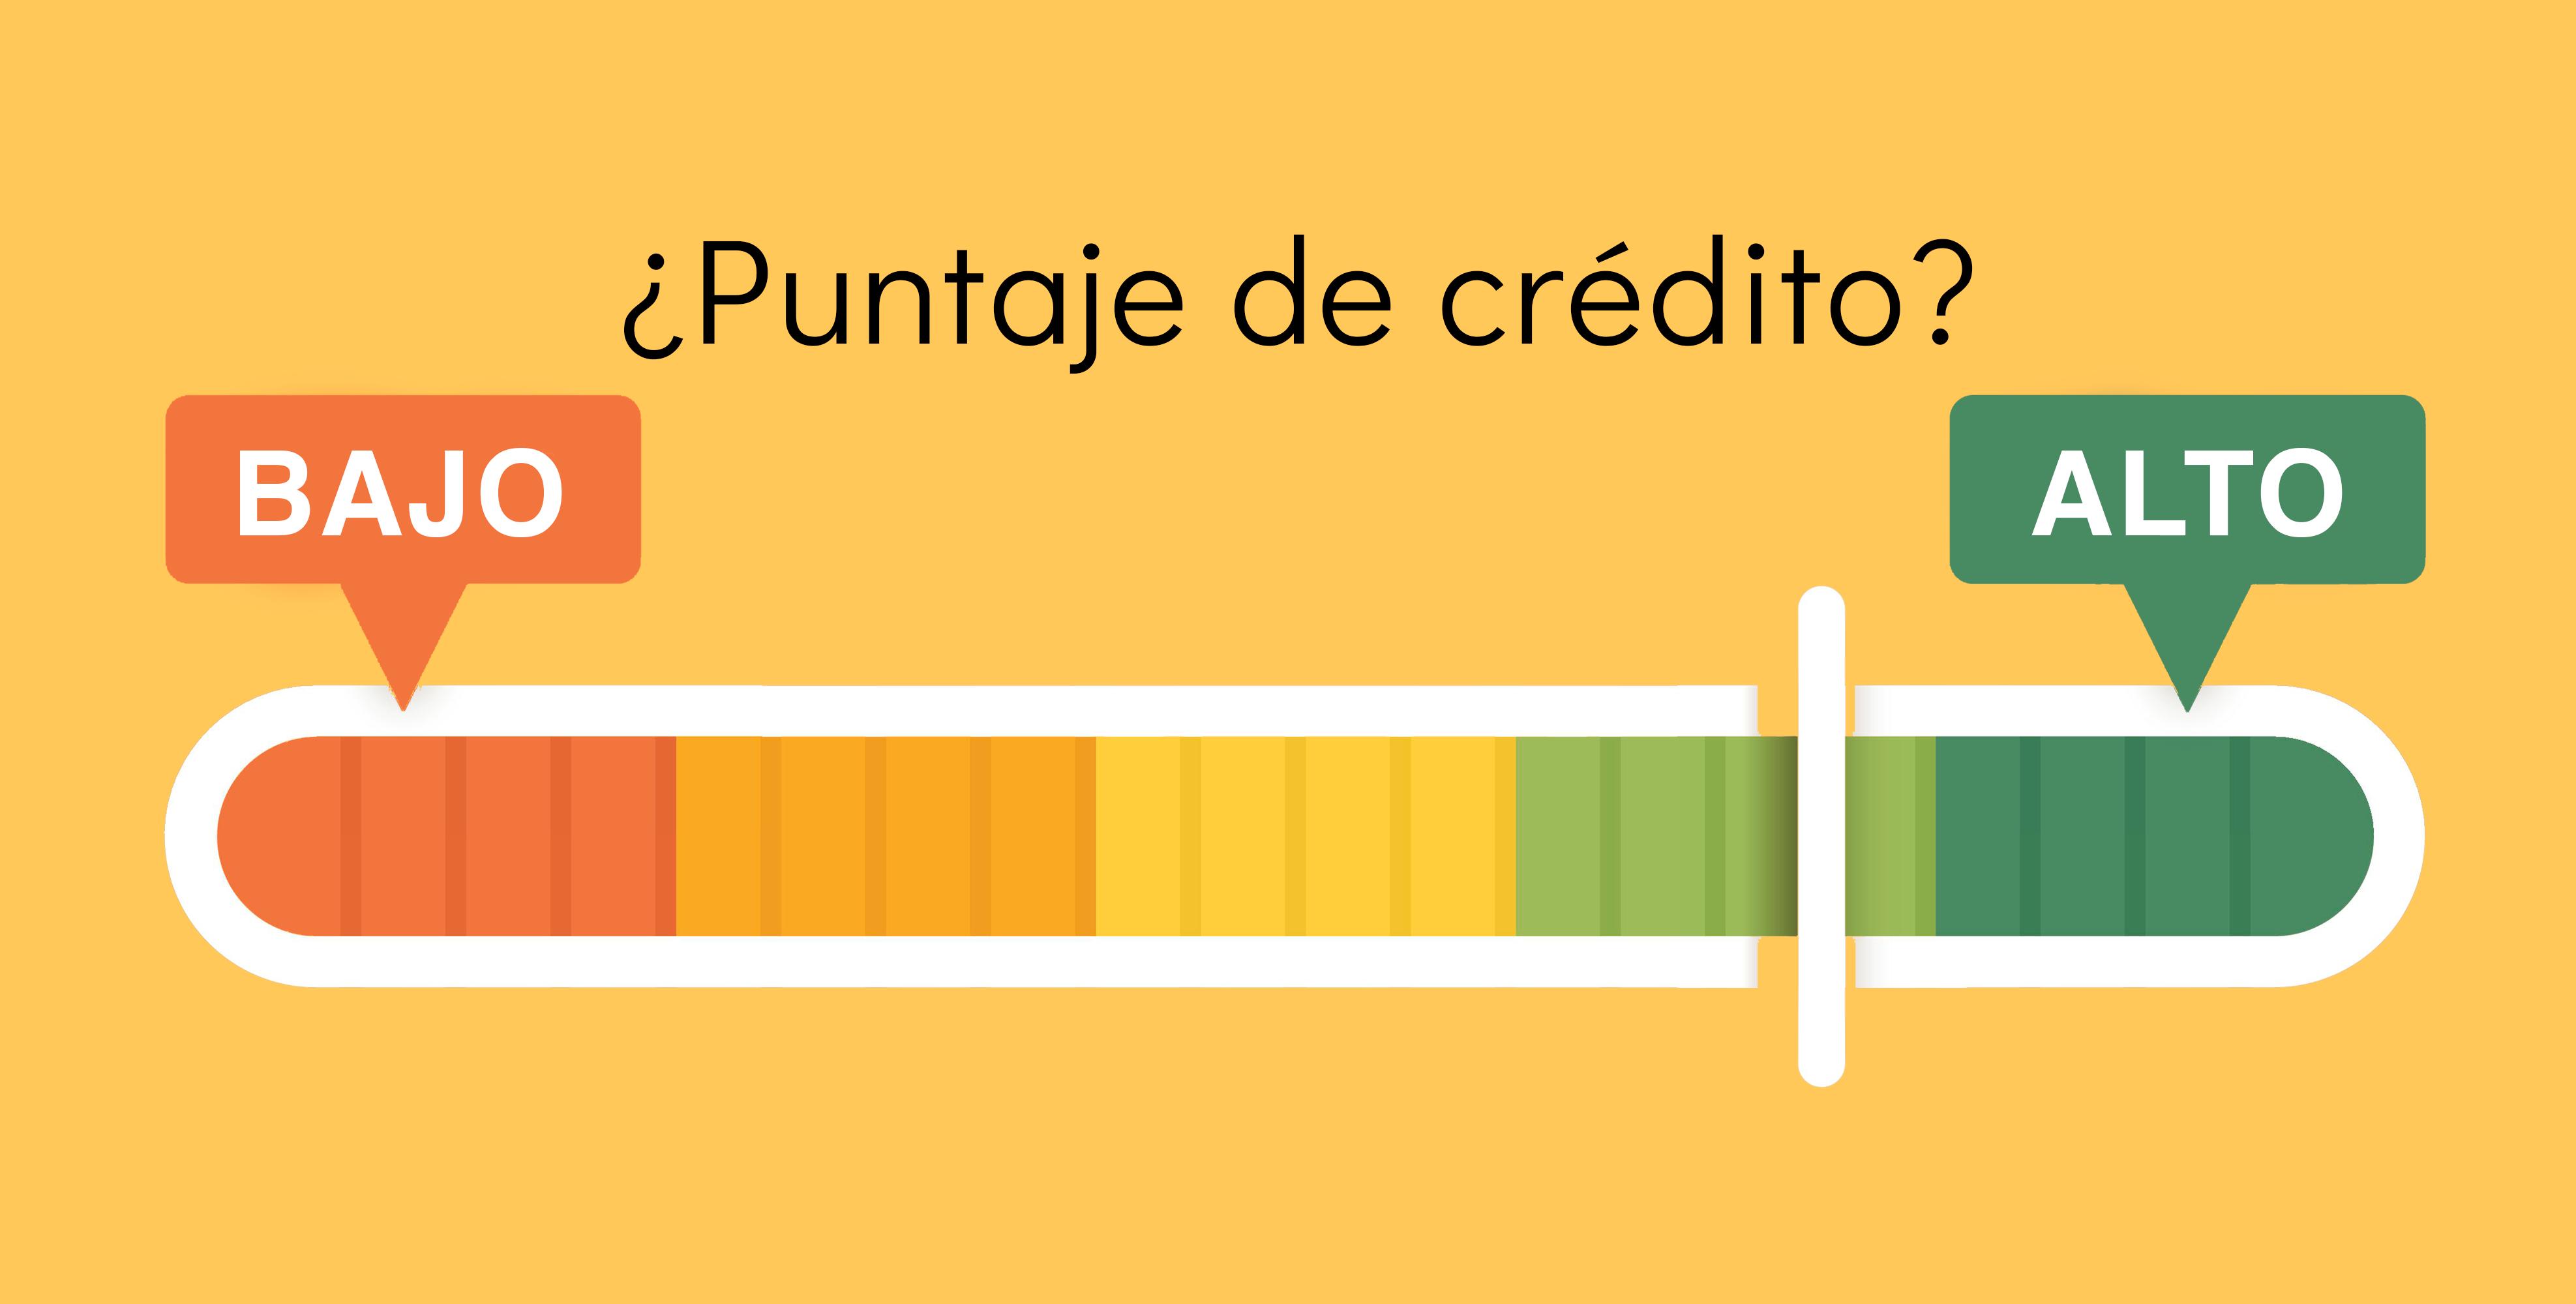 Score para puntaje de crédito